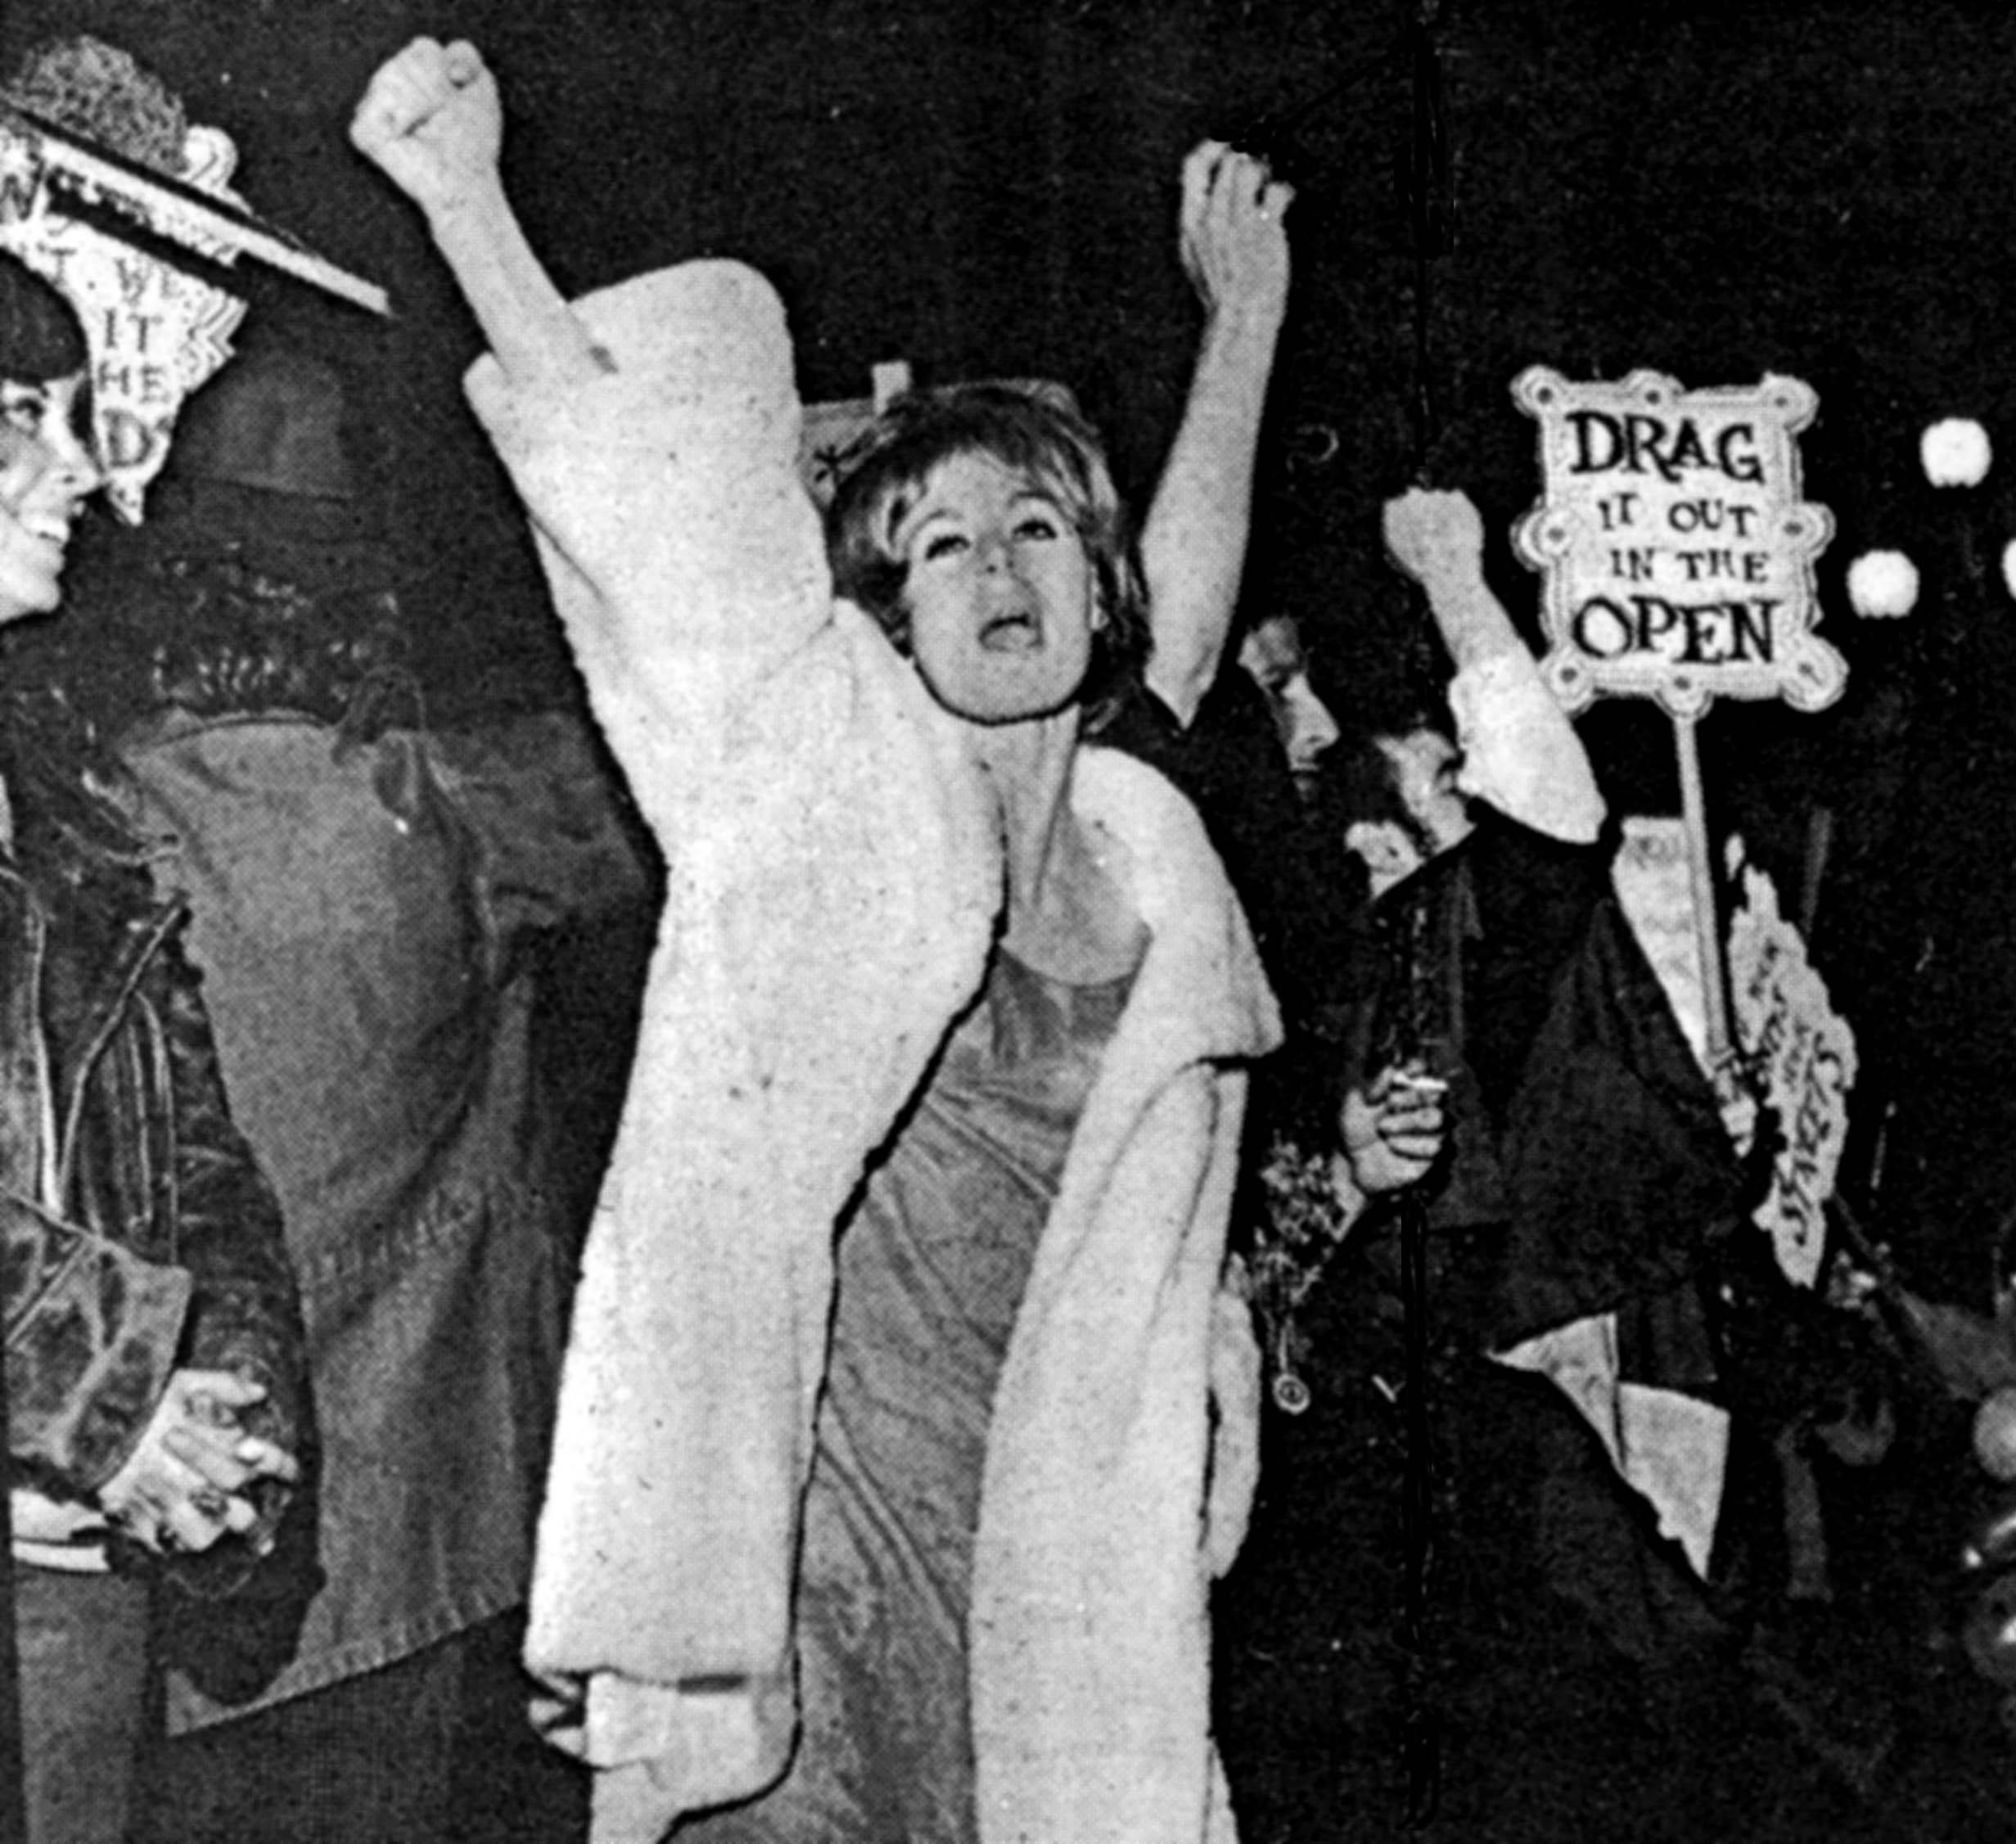 Pride: non c'è libertà senza rivolta  |  di Elisa Manici